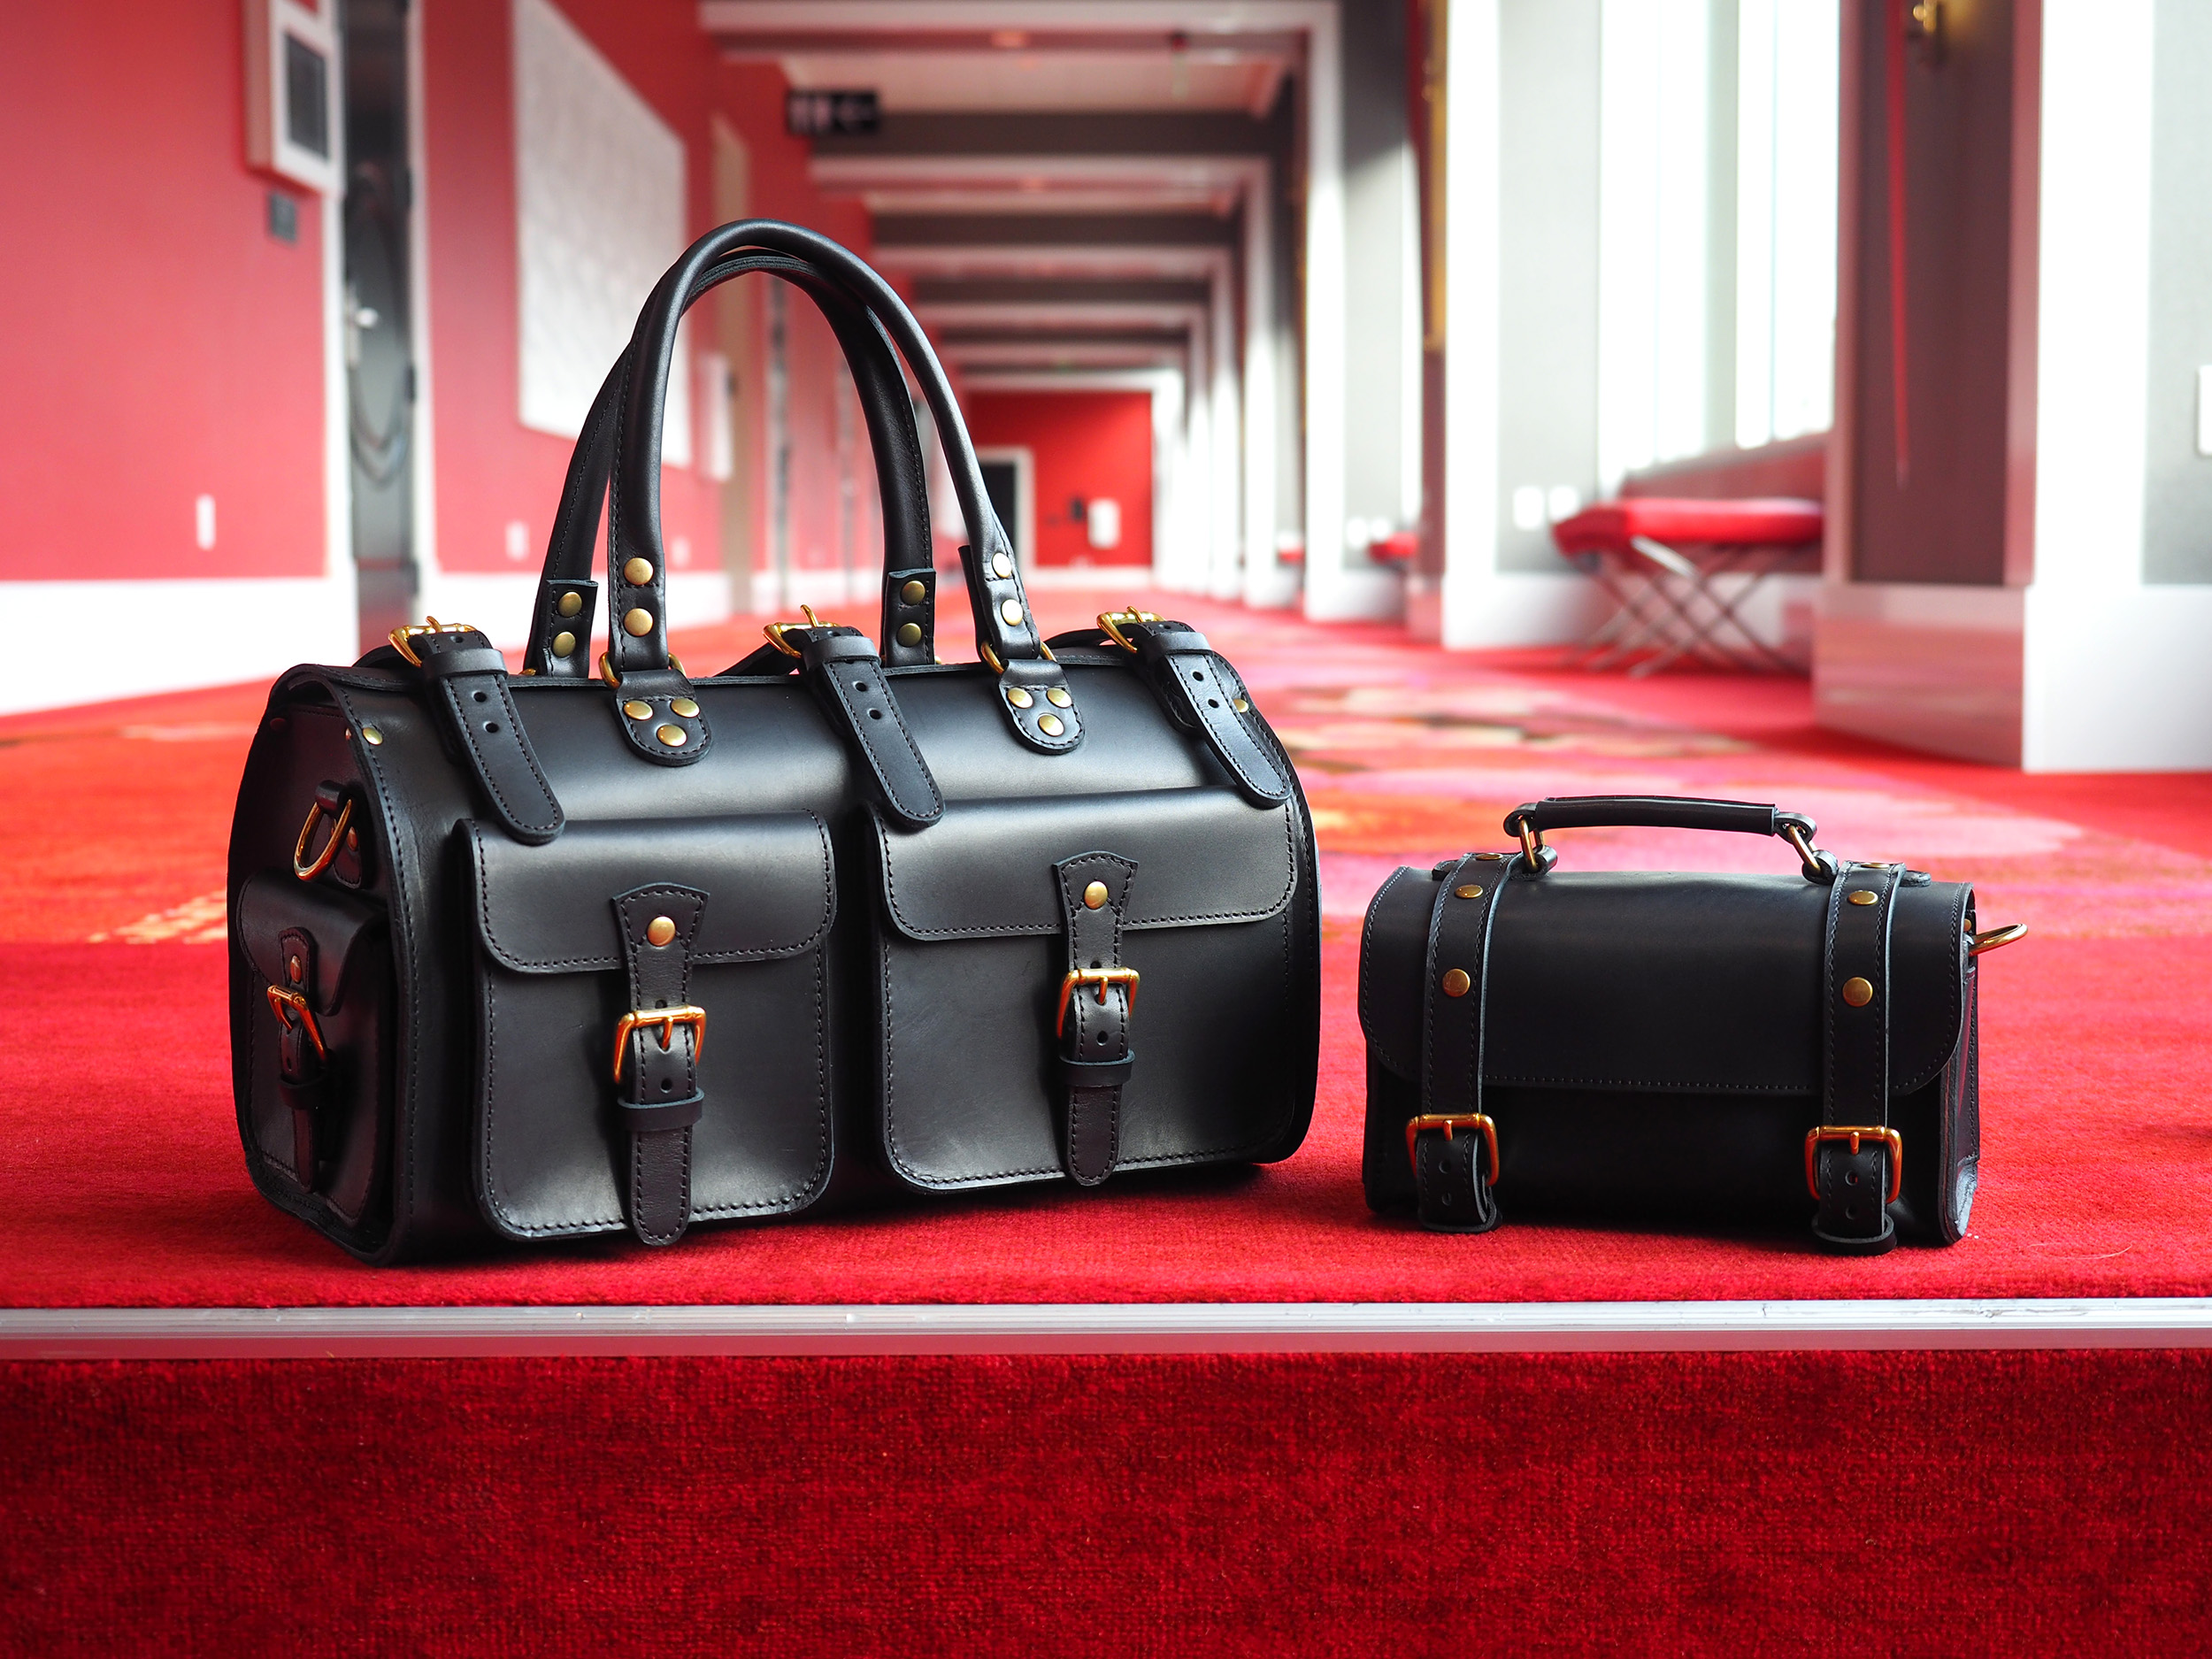 Marlondo Leather Spring Break Travel Gear Set - Black Veg Tan Leather Duffel Bag and Dopp Kit